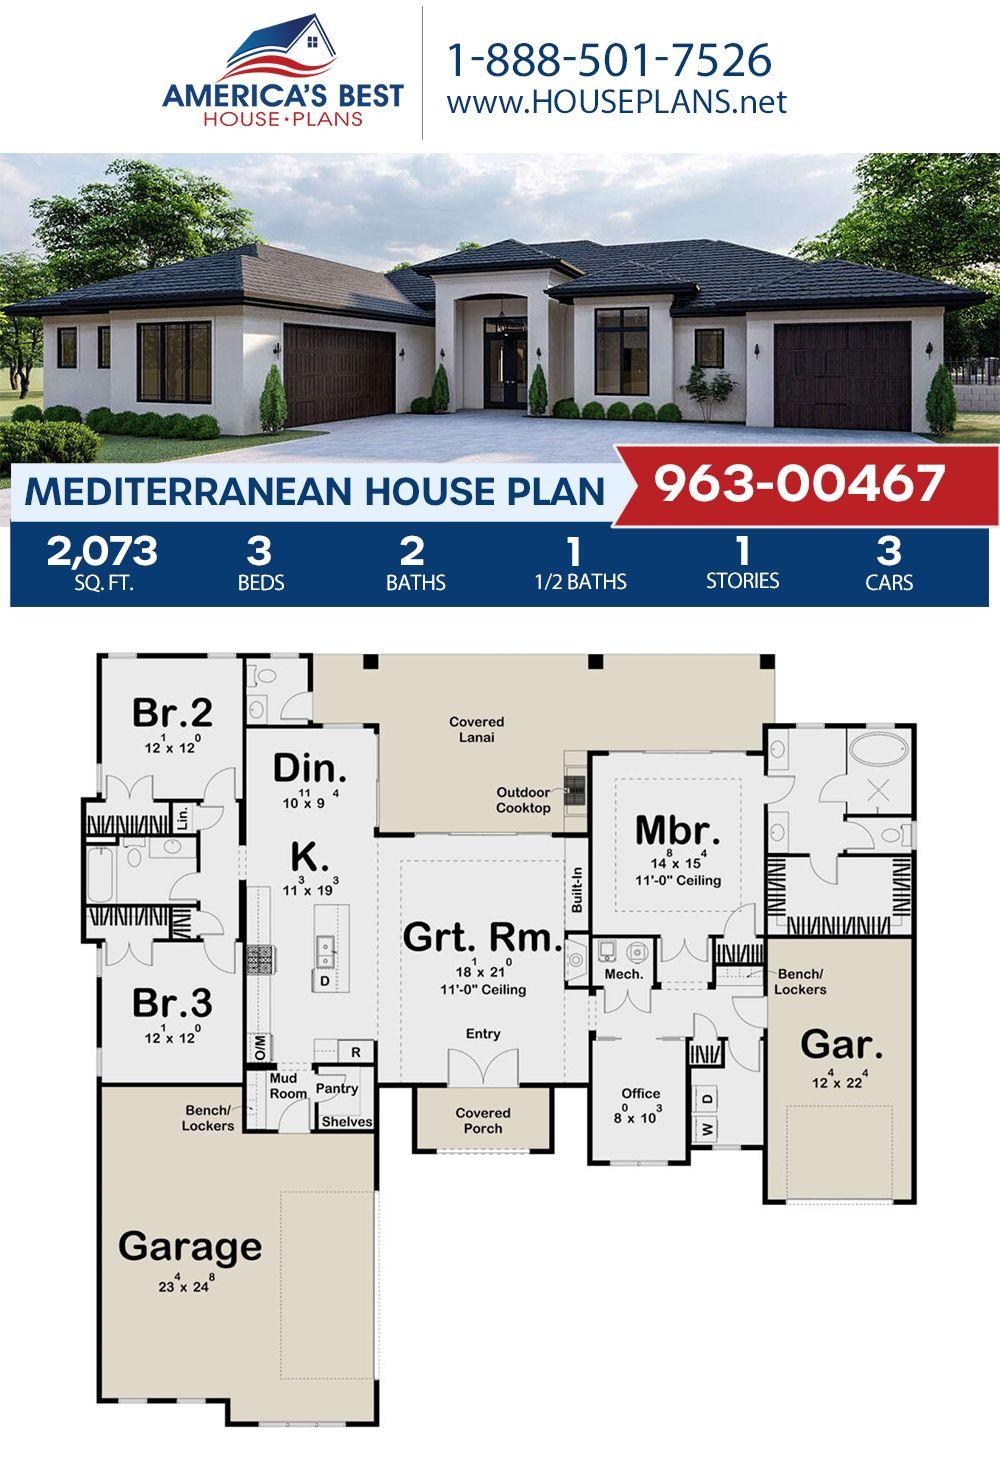 House Plan 963 00467 Mediterranean Plan 2 073 Square Feet 3 Bedrooms 2 5 Bathrooms Mediterranean House Plans Mediterranean Floor Plans Mediterranean House Plan